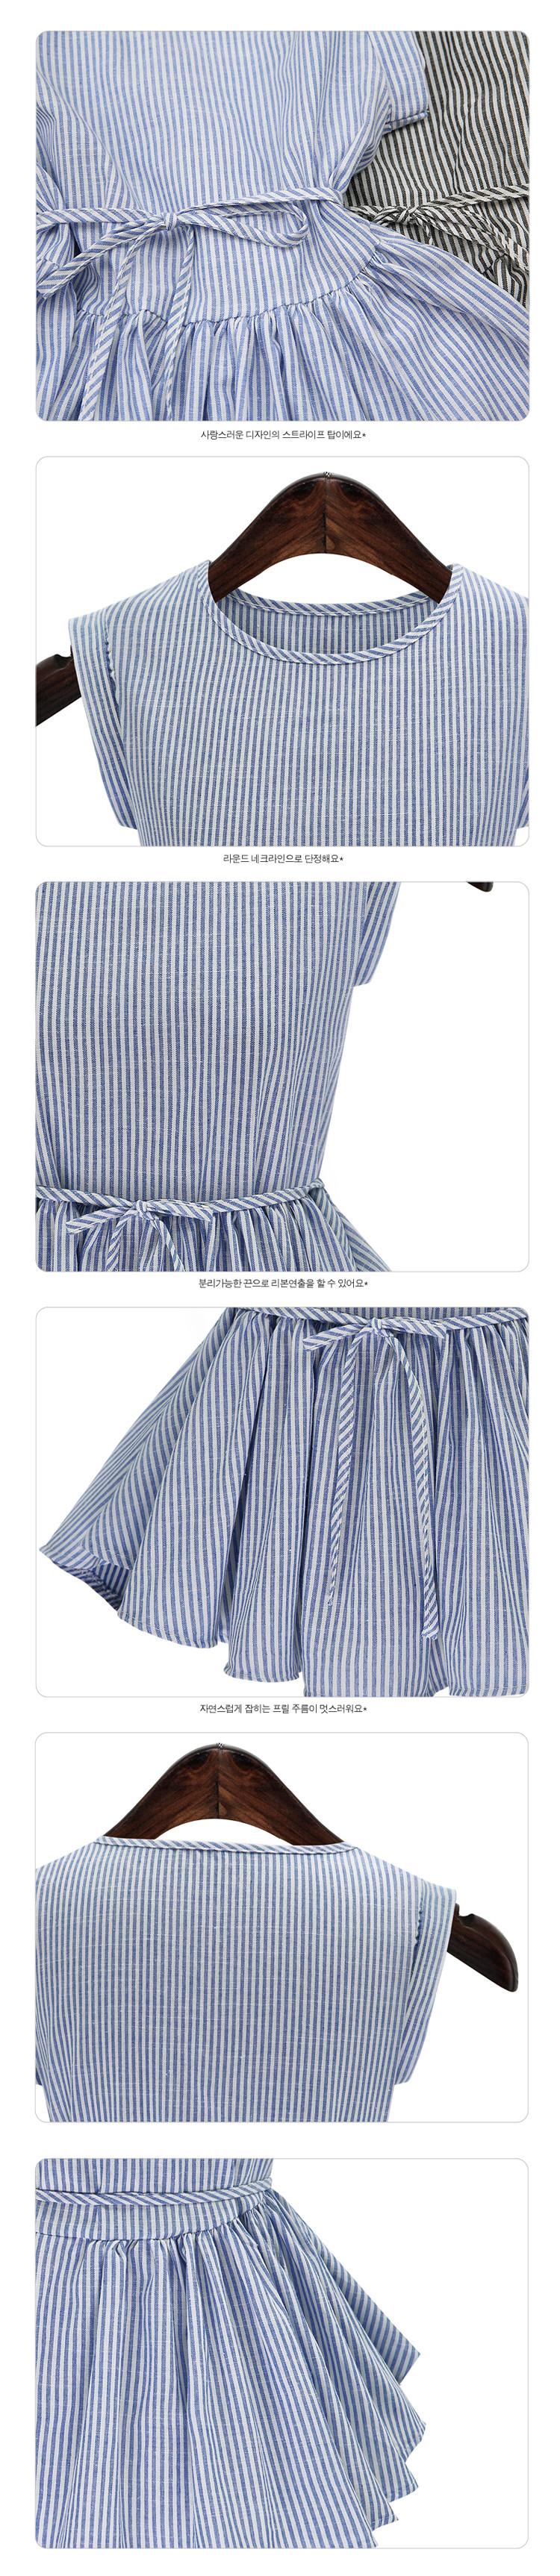 2016 New Designer Women Summer Striped Blouses Maxi Plus Size 5XL  Sleeveless Corrugated Edge Office Casual Shirts Female Blouse - us639 0b57c469082f